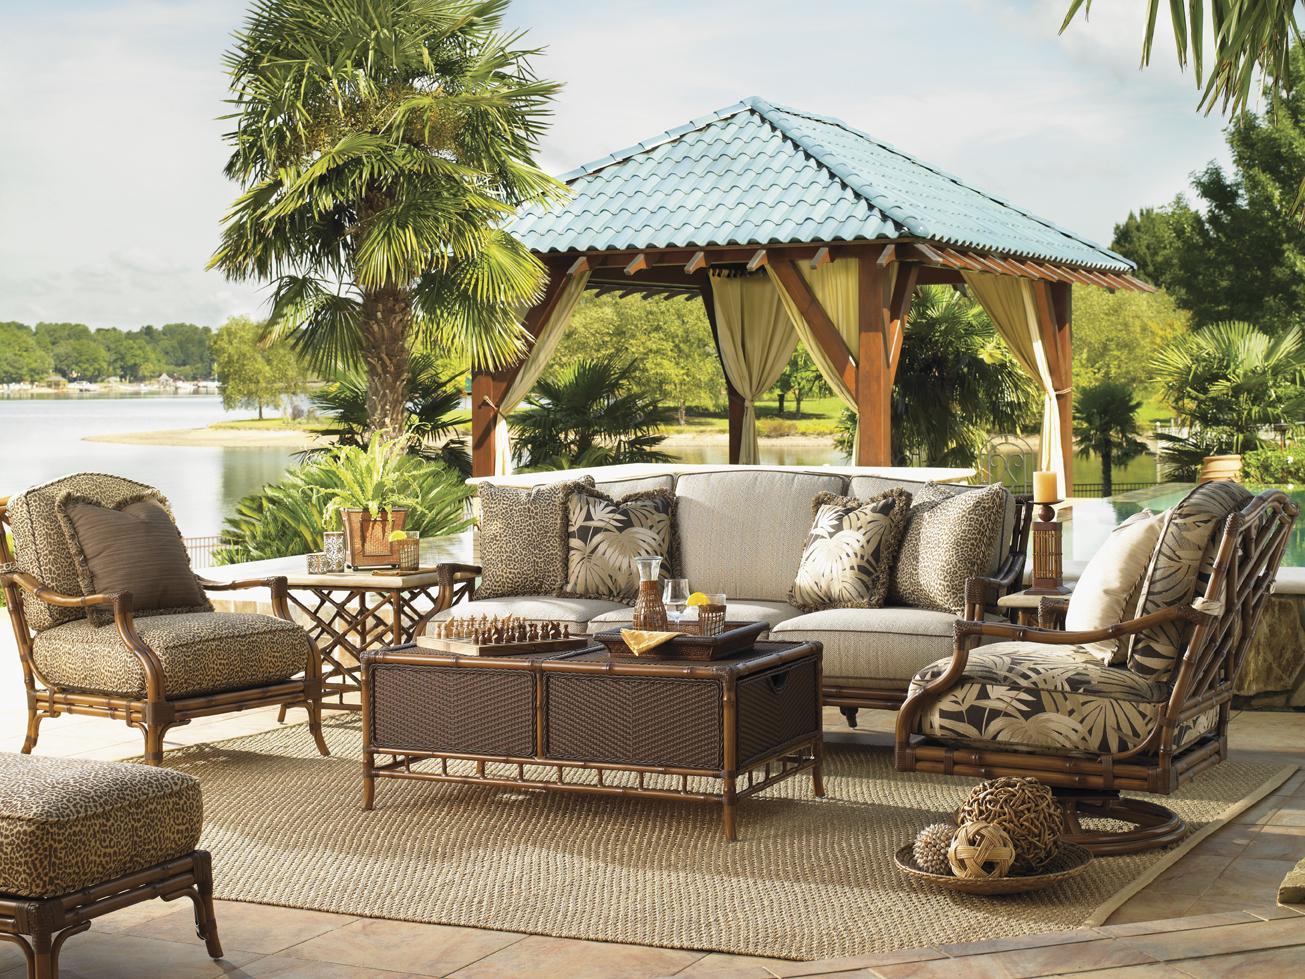 Island Estate Veranda 3160 By Tommy Bahama Outdoor